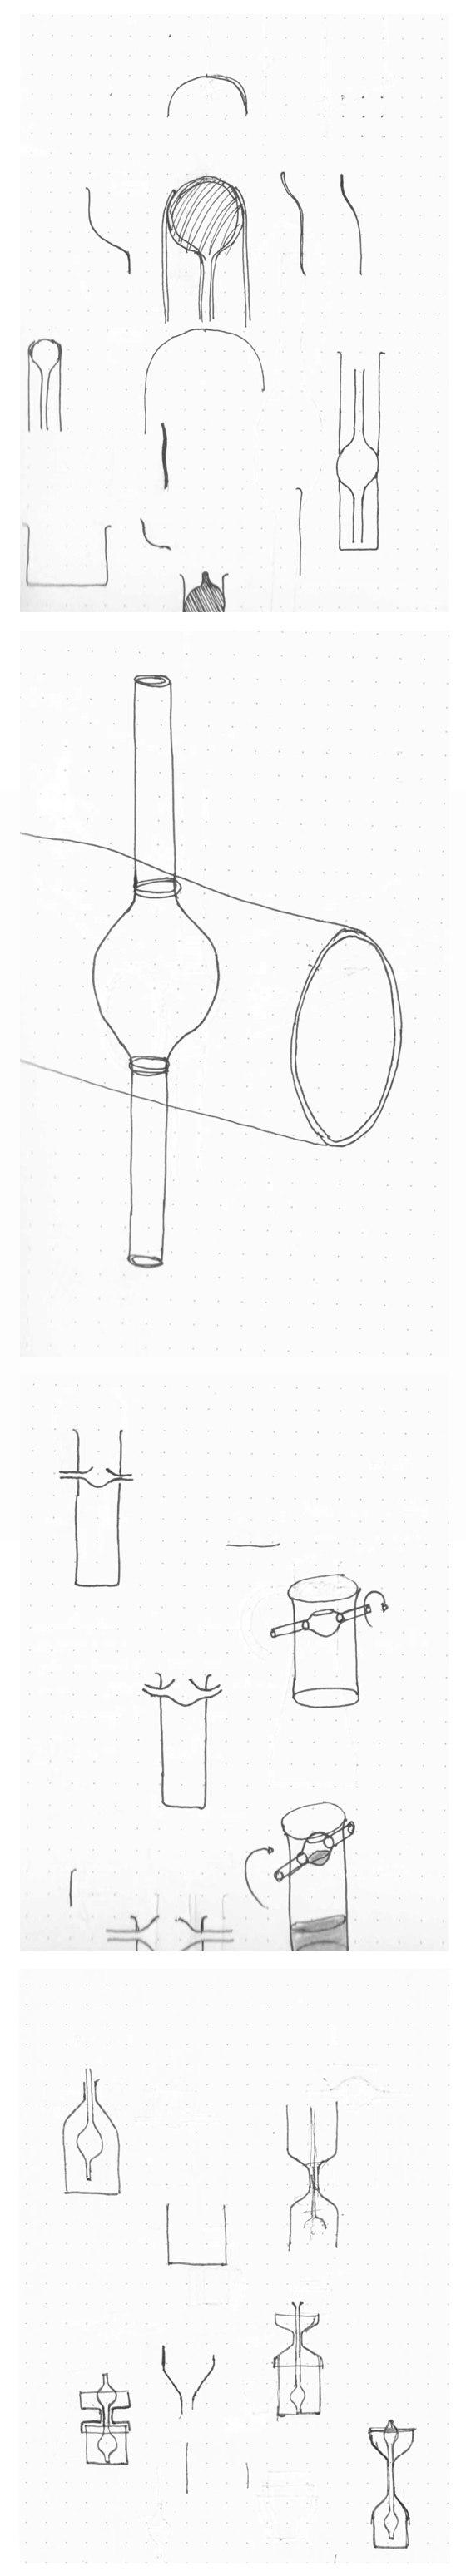 Witt by Emilien Jaury   Prototypes